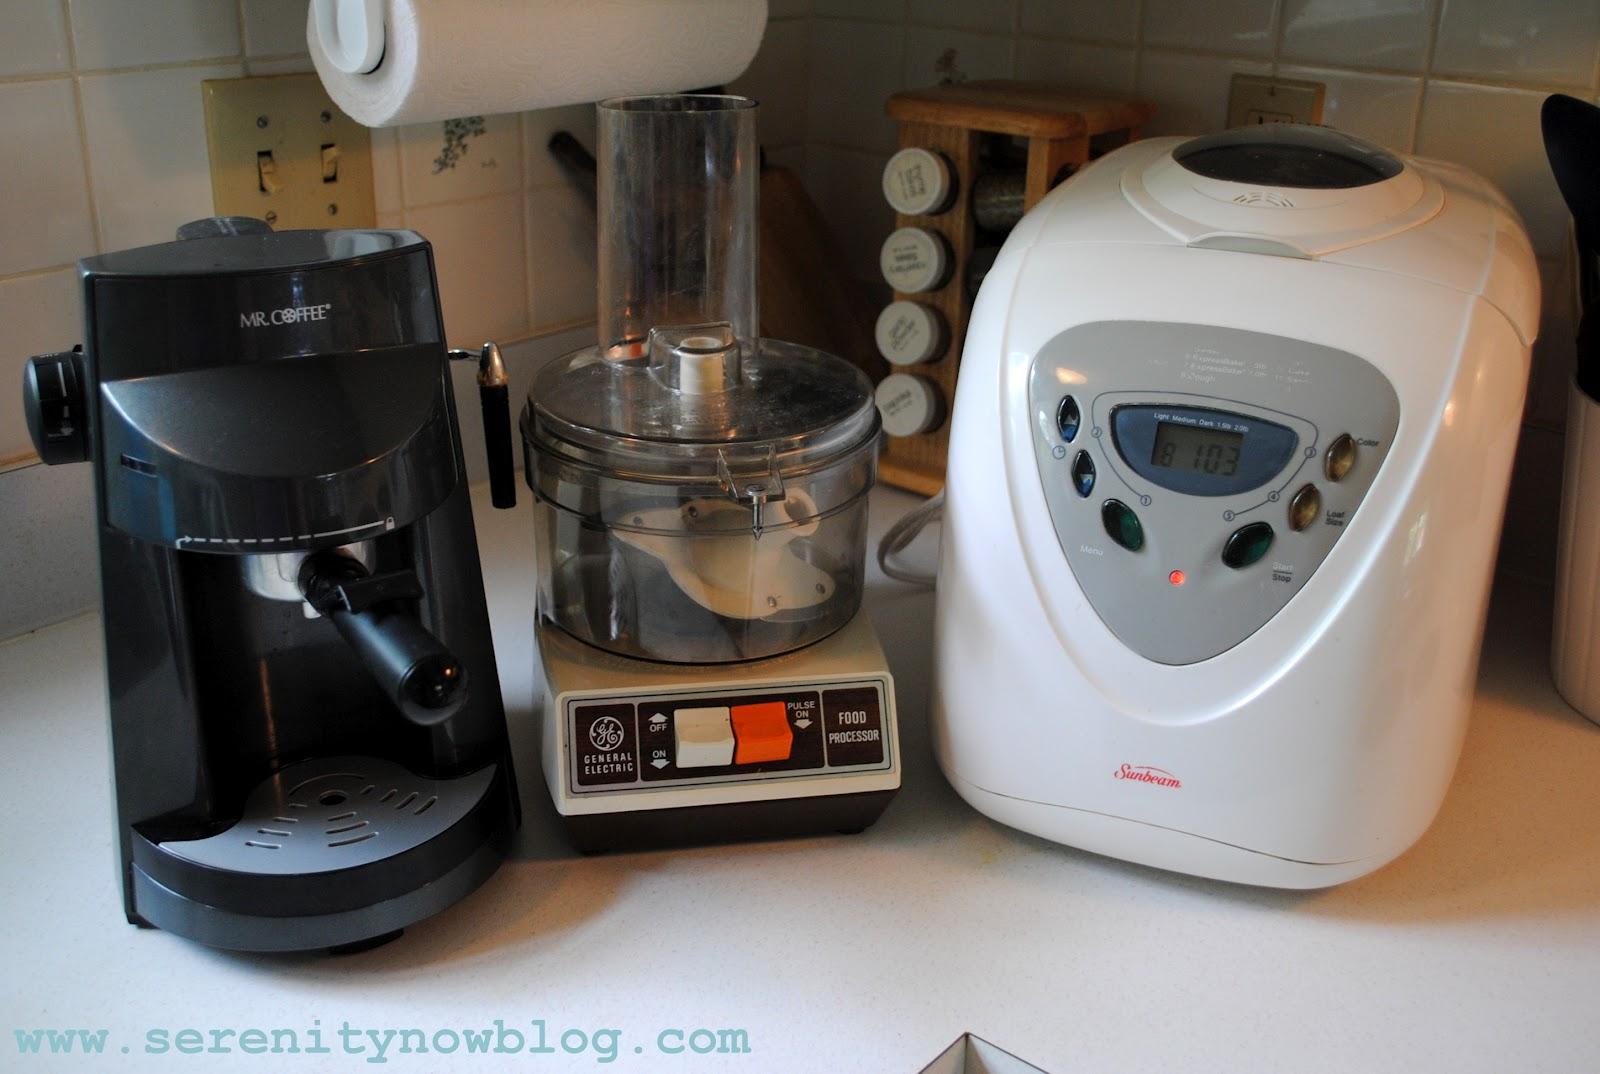 Breadmaker By Mr Coffee Recipes